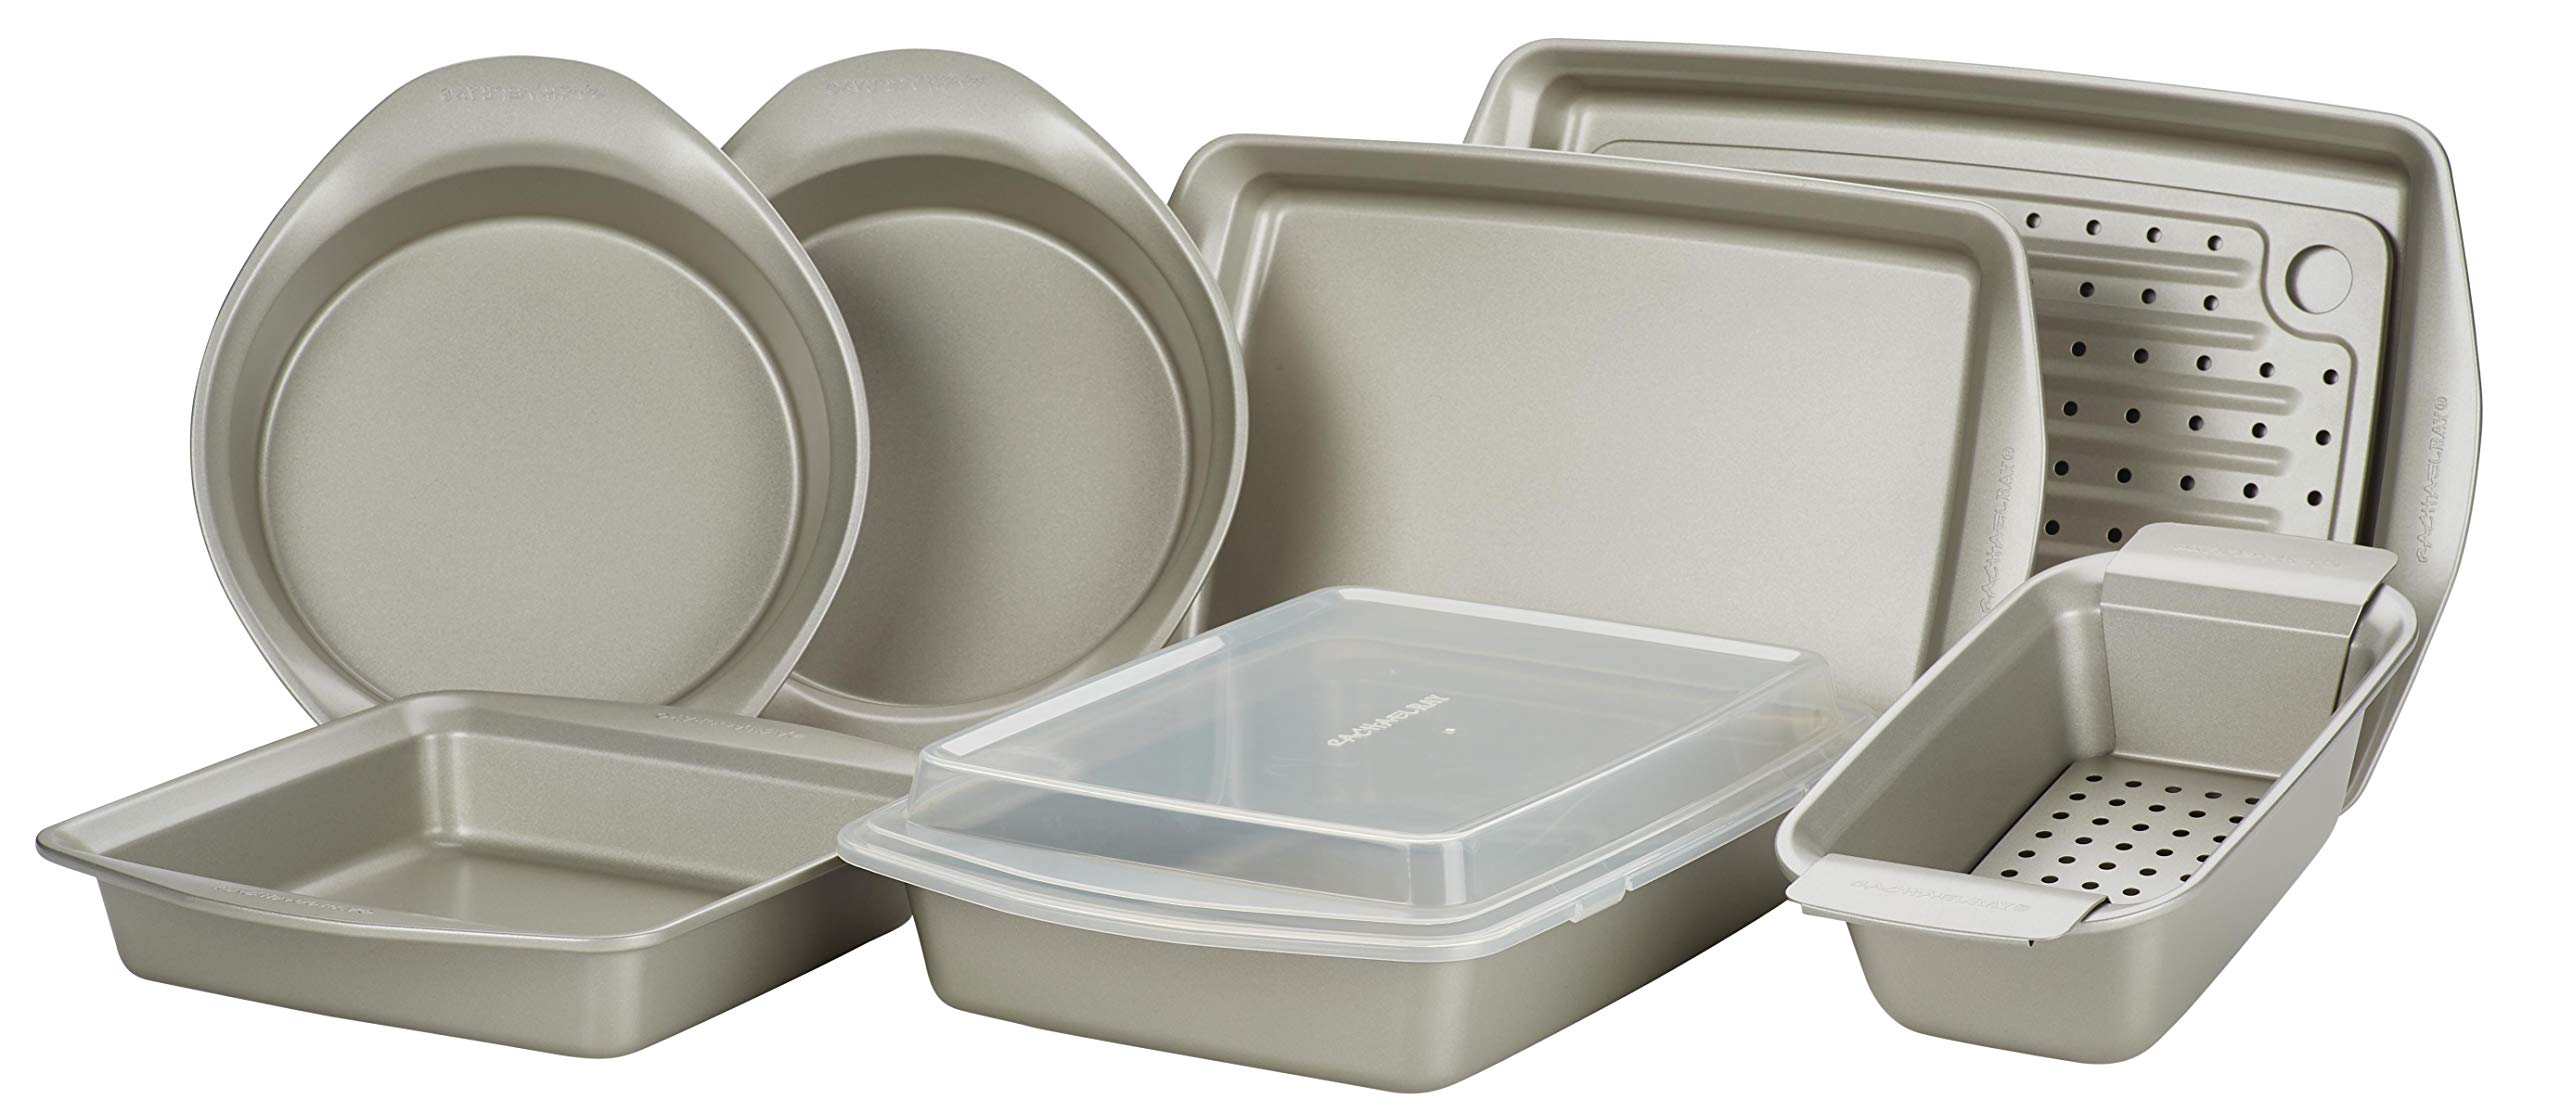 Rachael Ray Nonstick Bakeware Set, 10-Piece, Silver